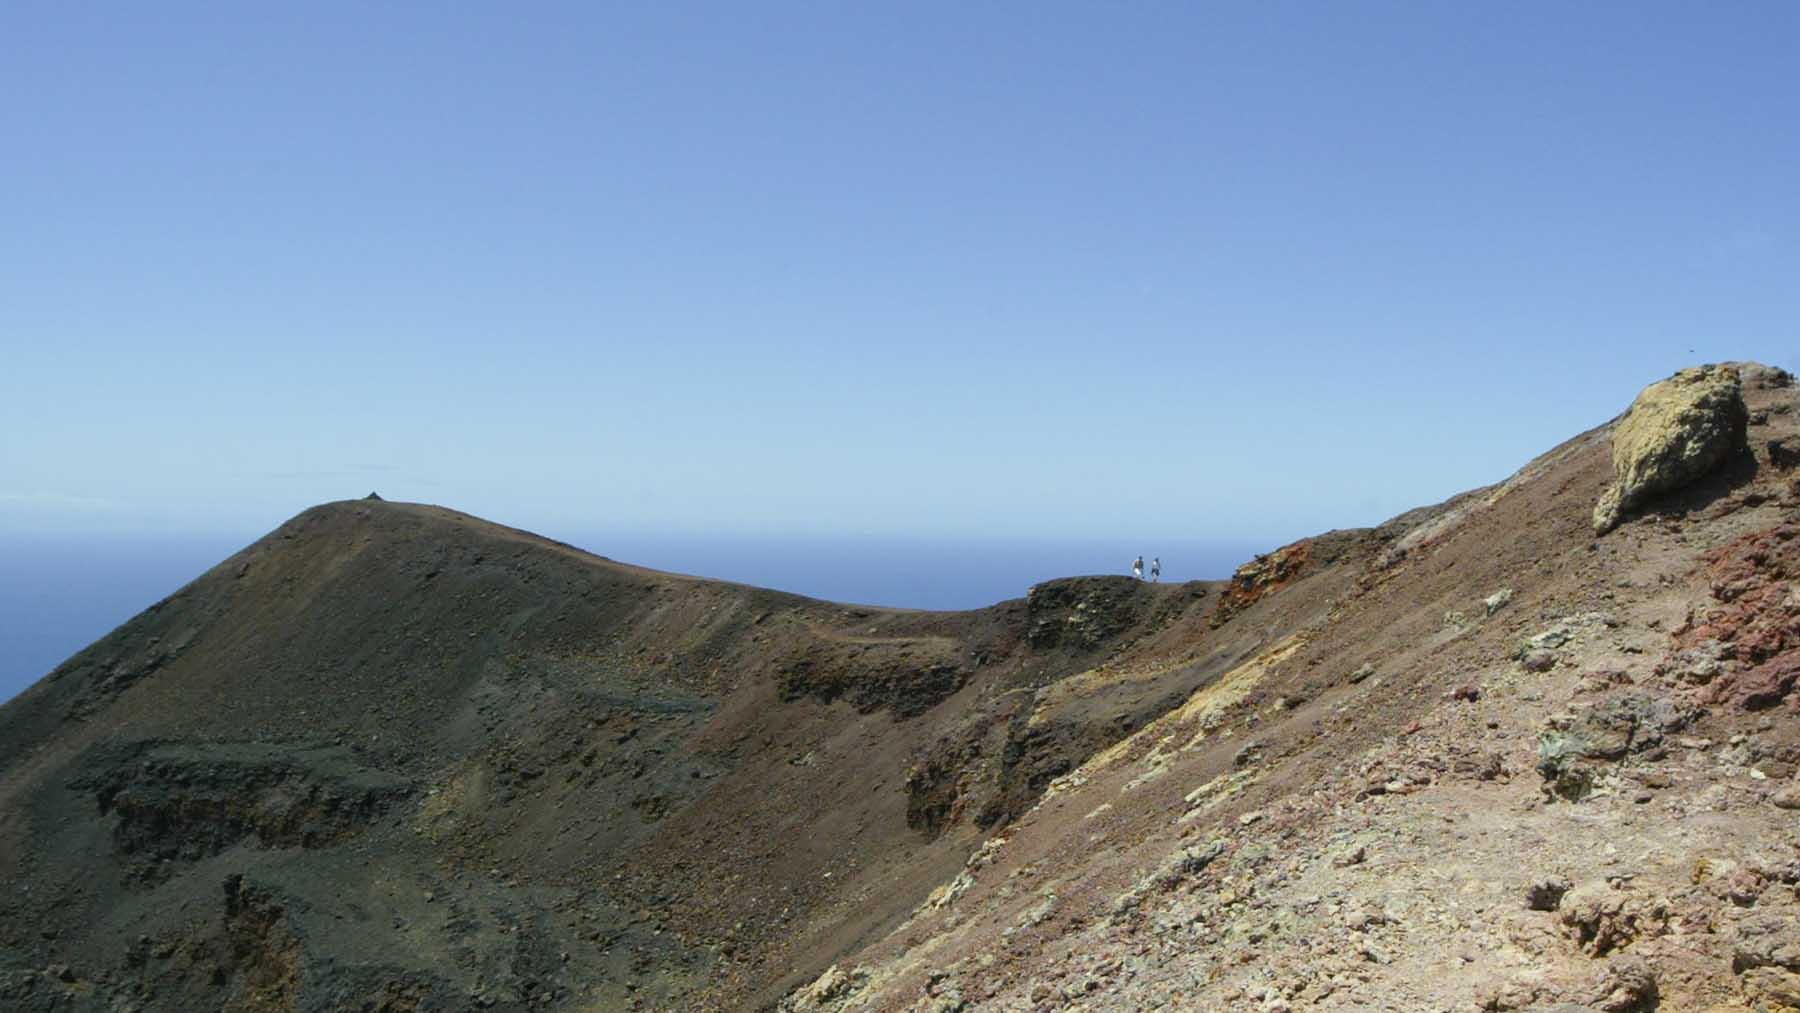 Cumbre Vieja en la isla de La Palma. Foto: Europa Press.